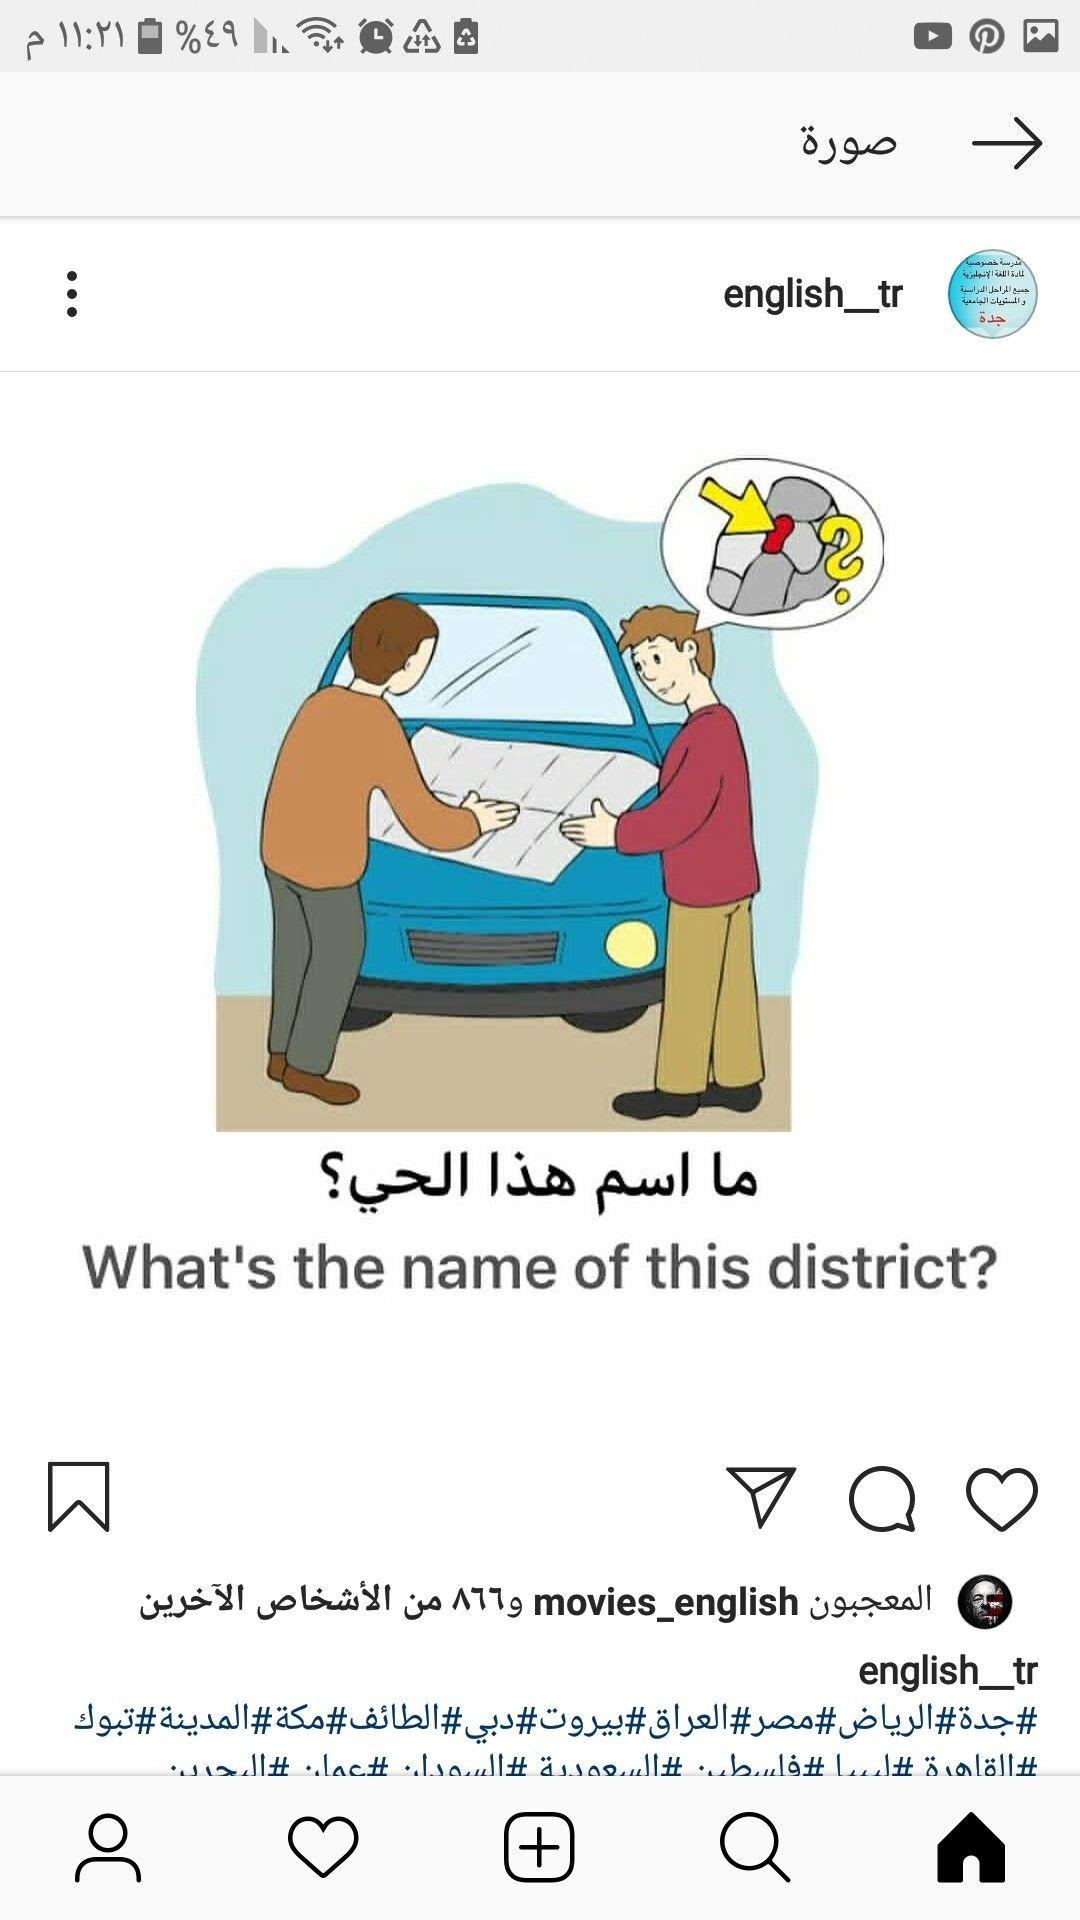 Pin By Farah Hossam El Deen On كلمات في جمل اميره خالد امينه English Language Learning Grammar English Vocabulary List English Language Learning